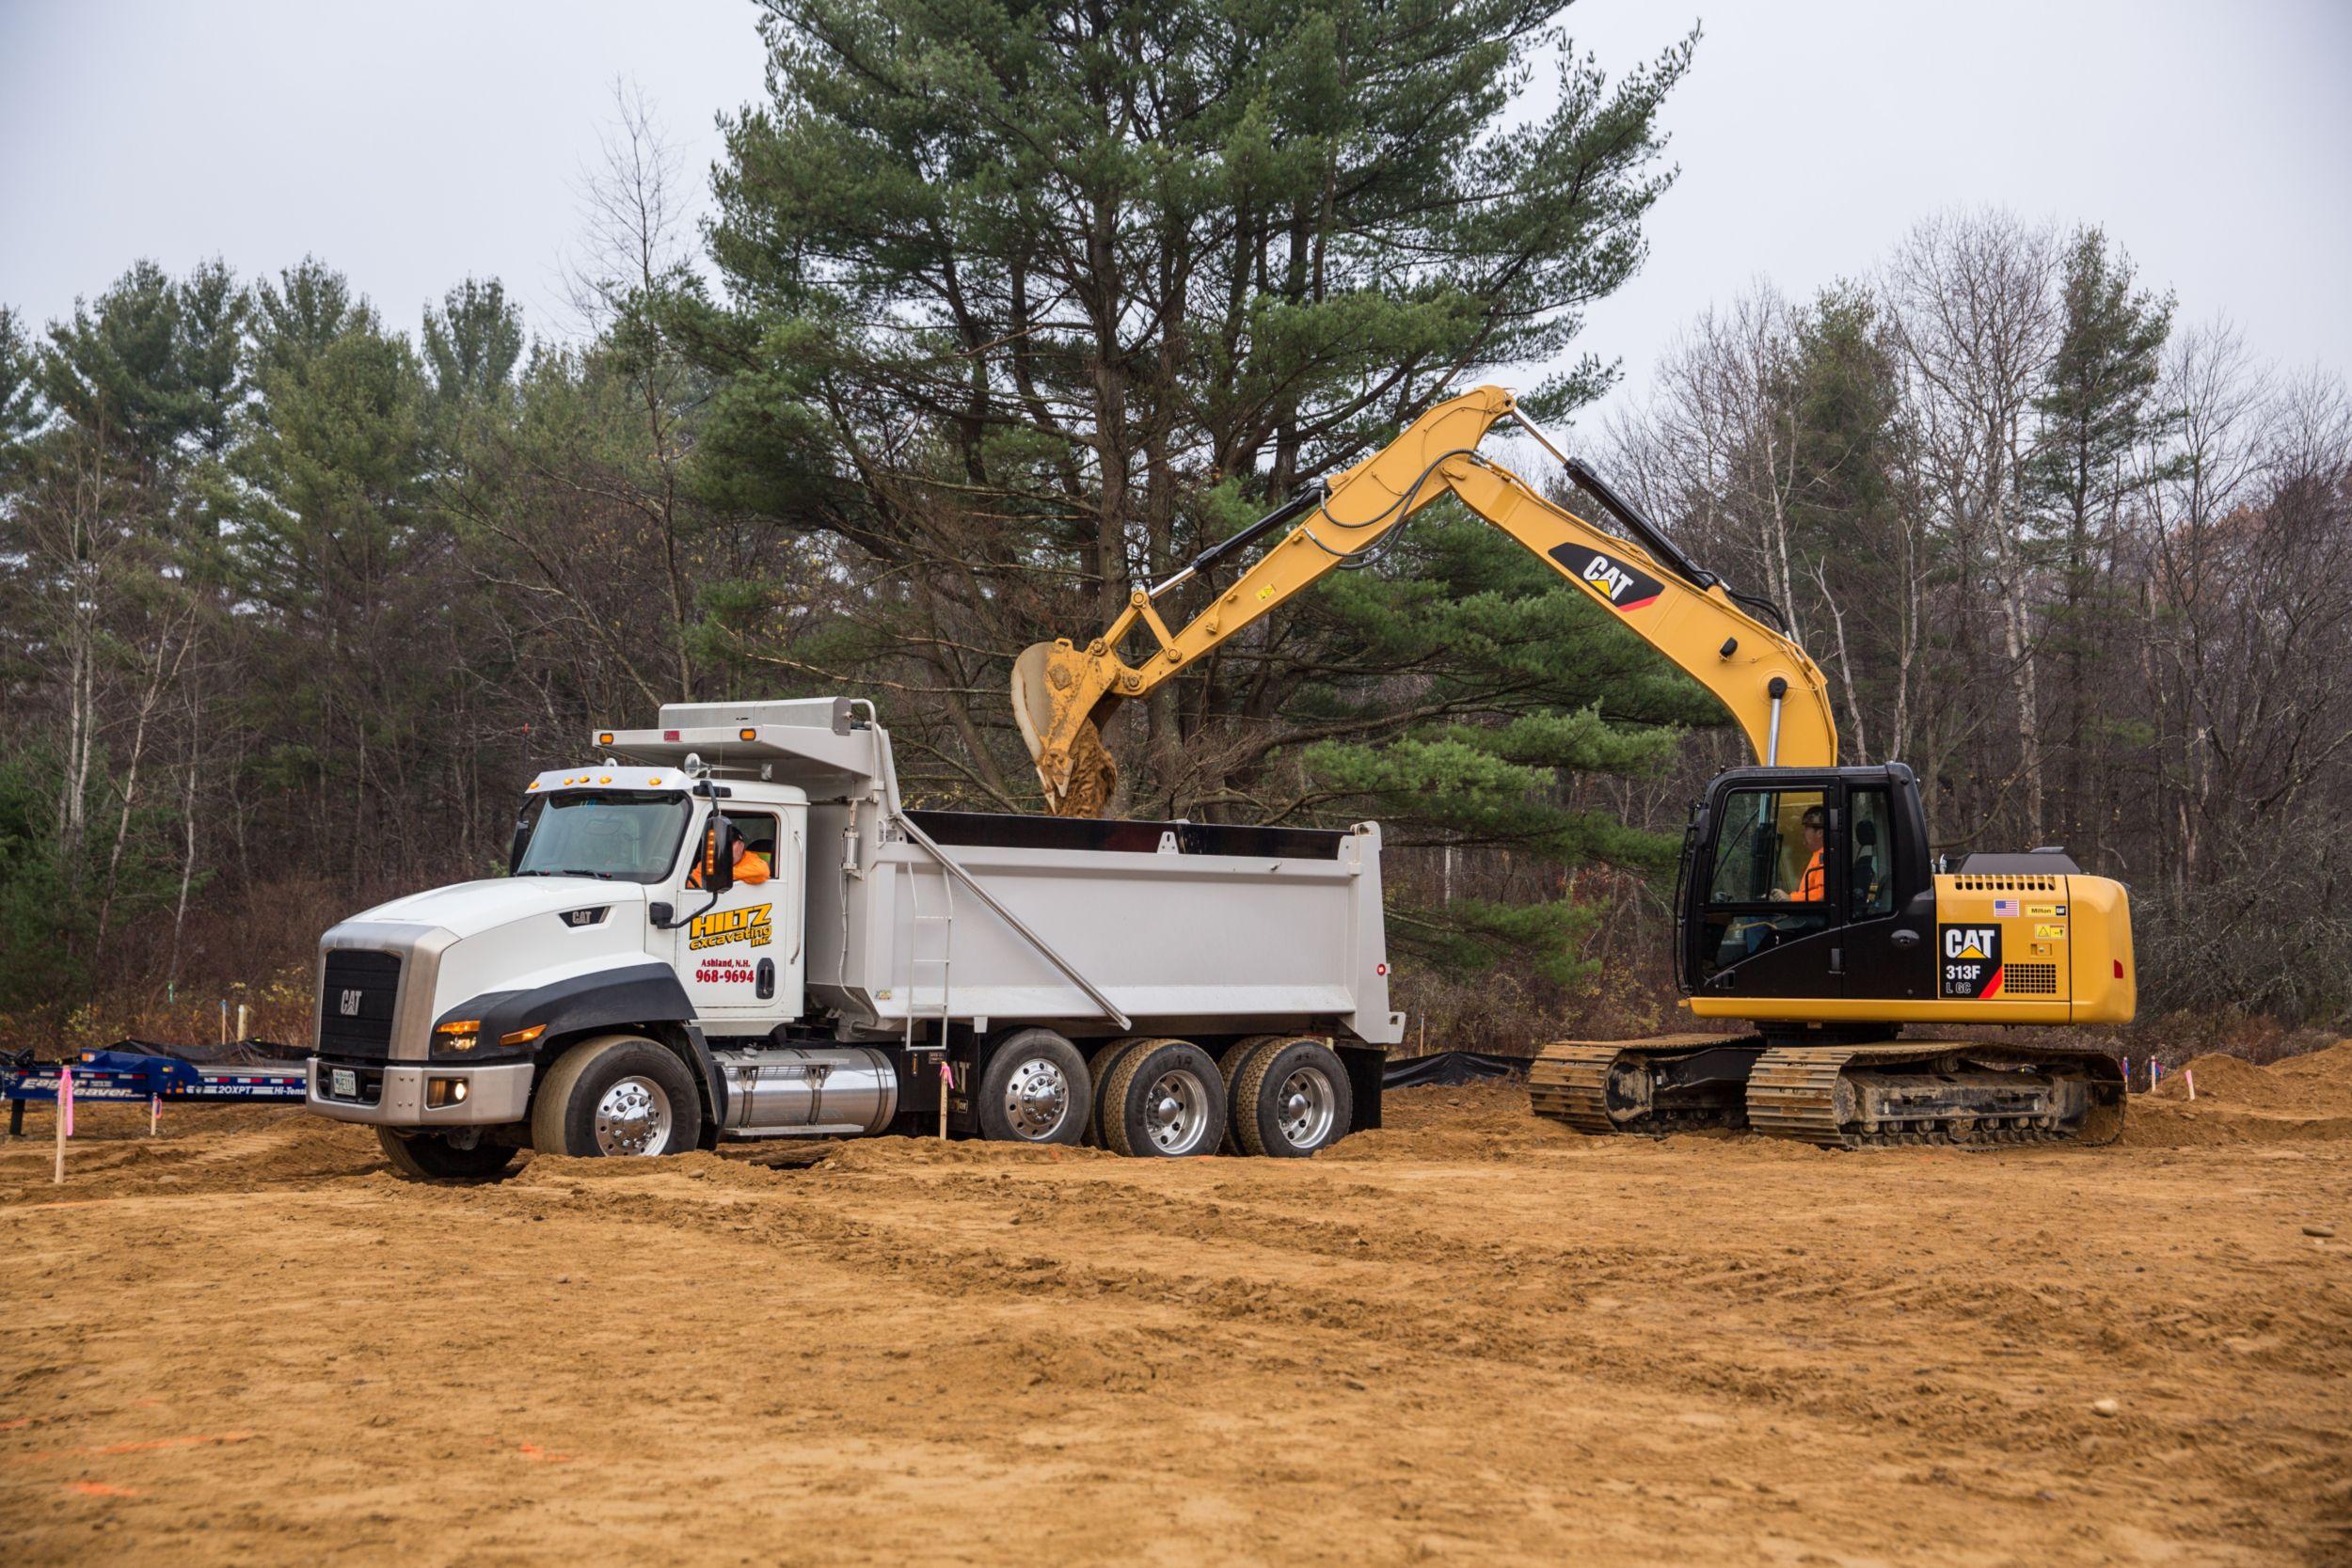 313F GC Hydraulic Excavator truck loading>